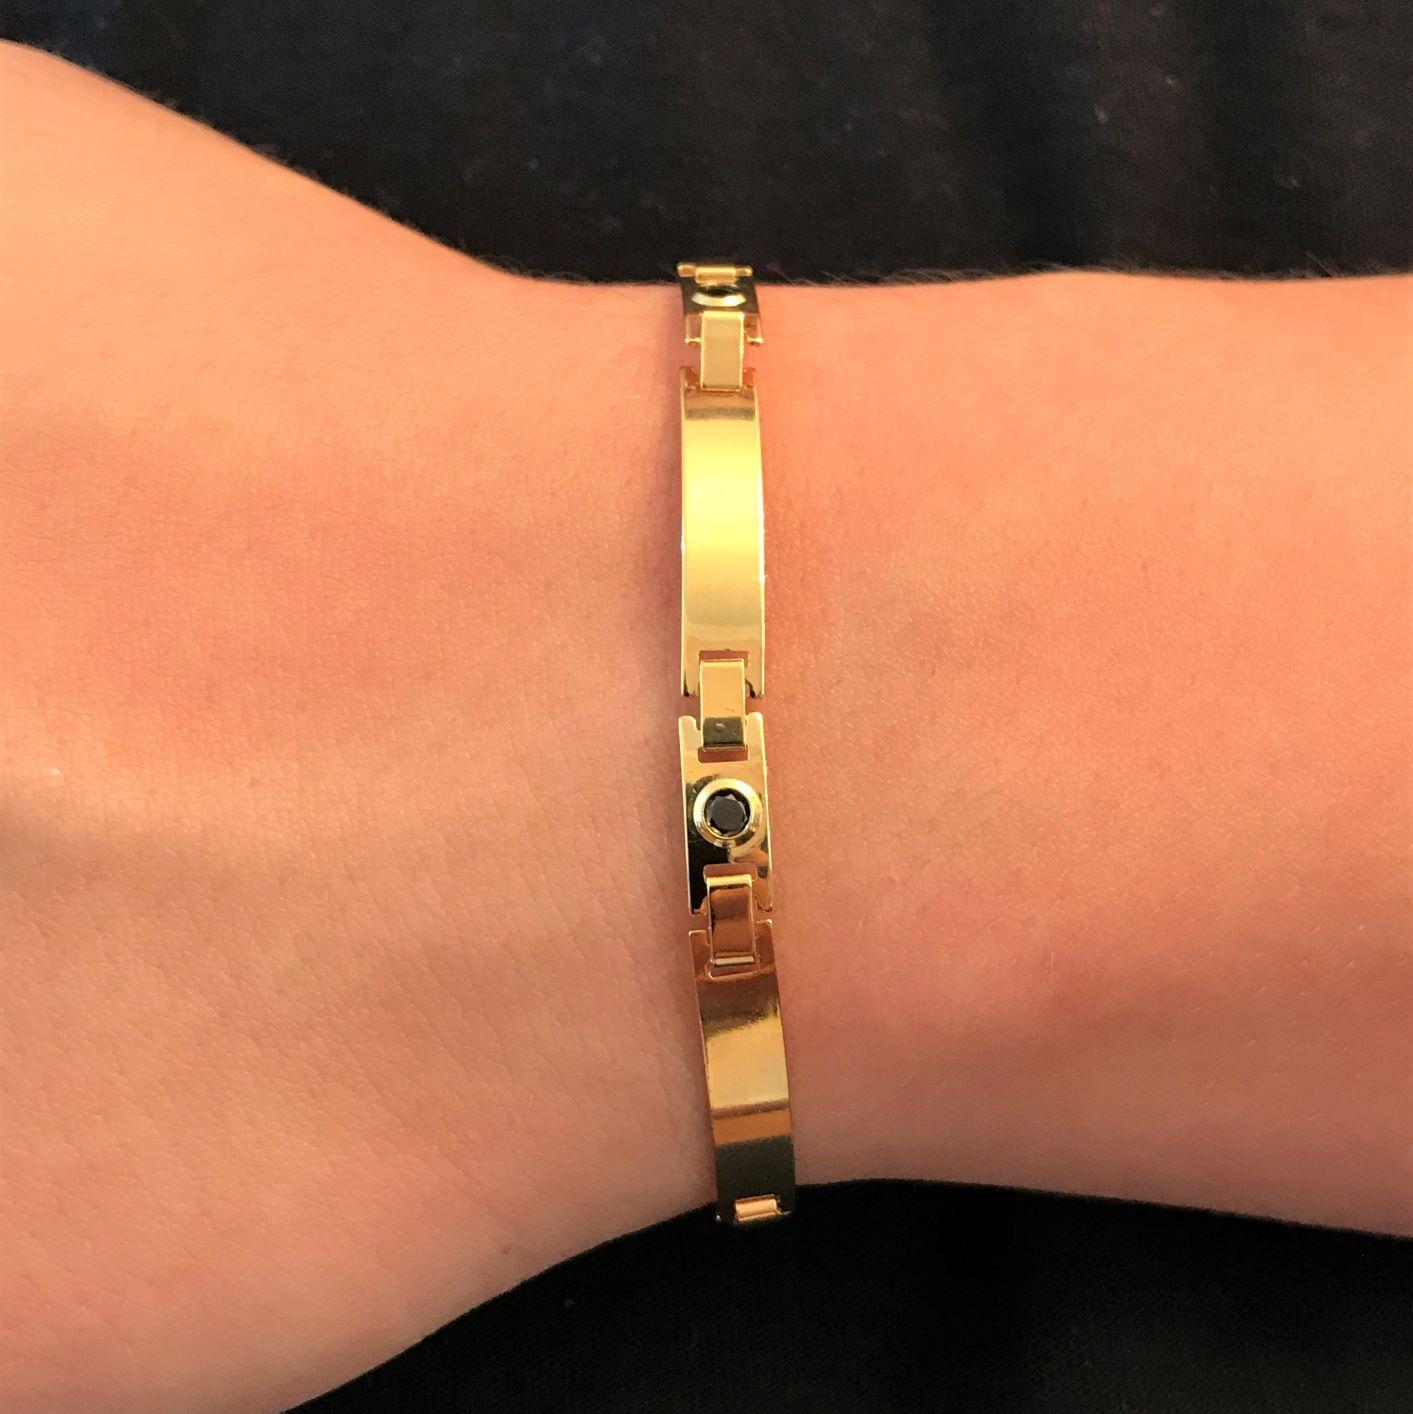 Bracelete Liso c/ Pedra Preta de Zirônia 5mm (Banho Ouro 24k)